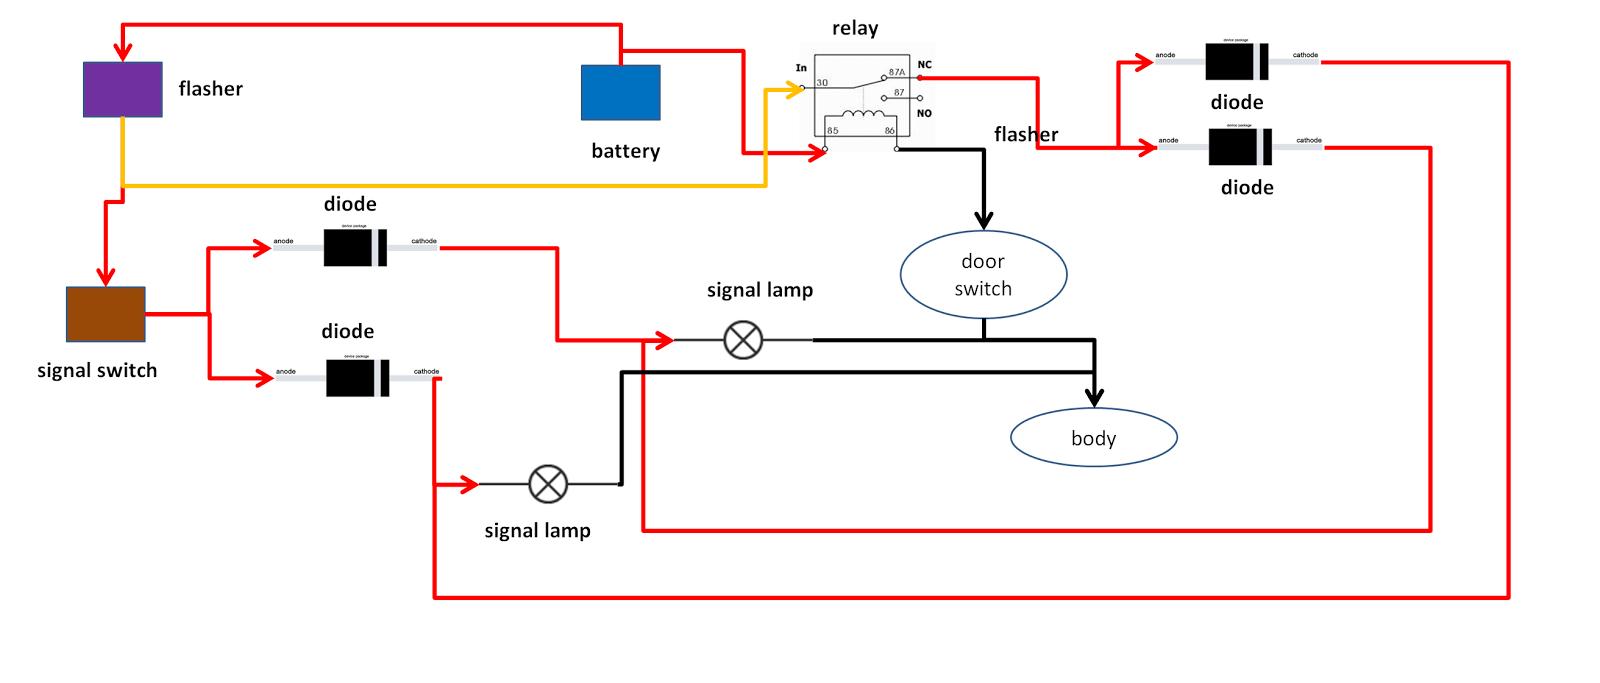 kereta ku sayang rh keretakusayangku blogspot com 11 Pin Relay Wiring Diagram Arduino Relay Wiring